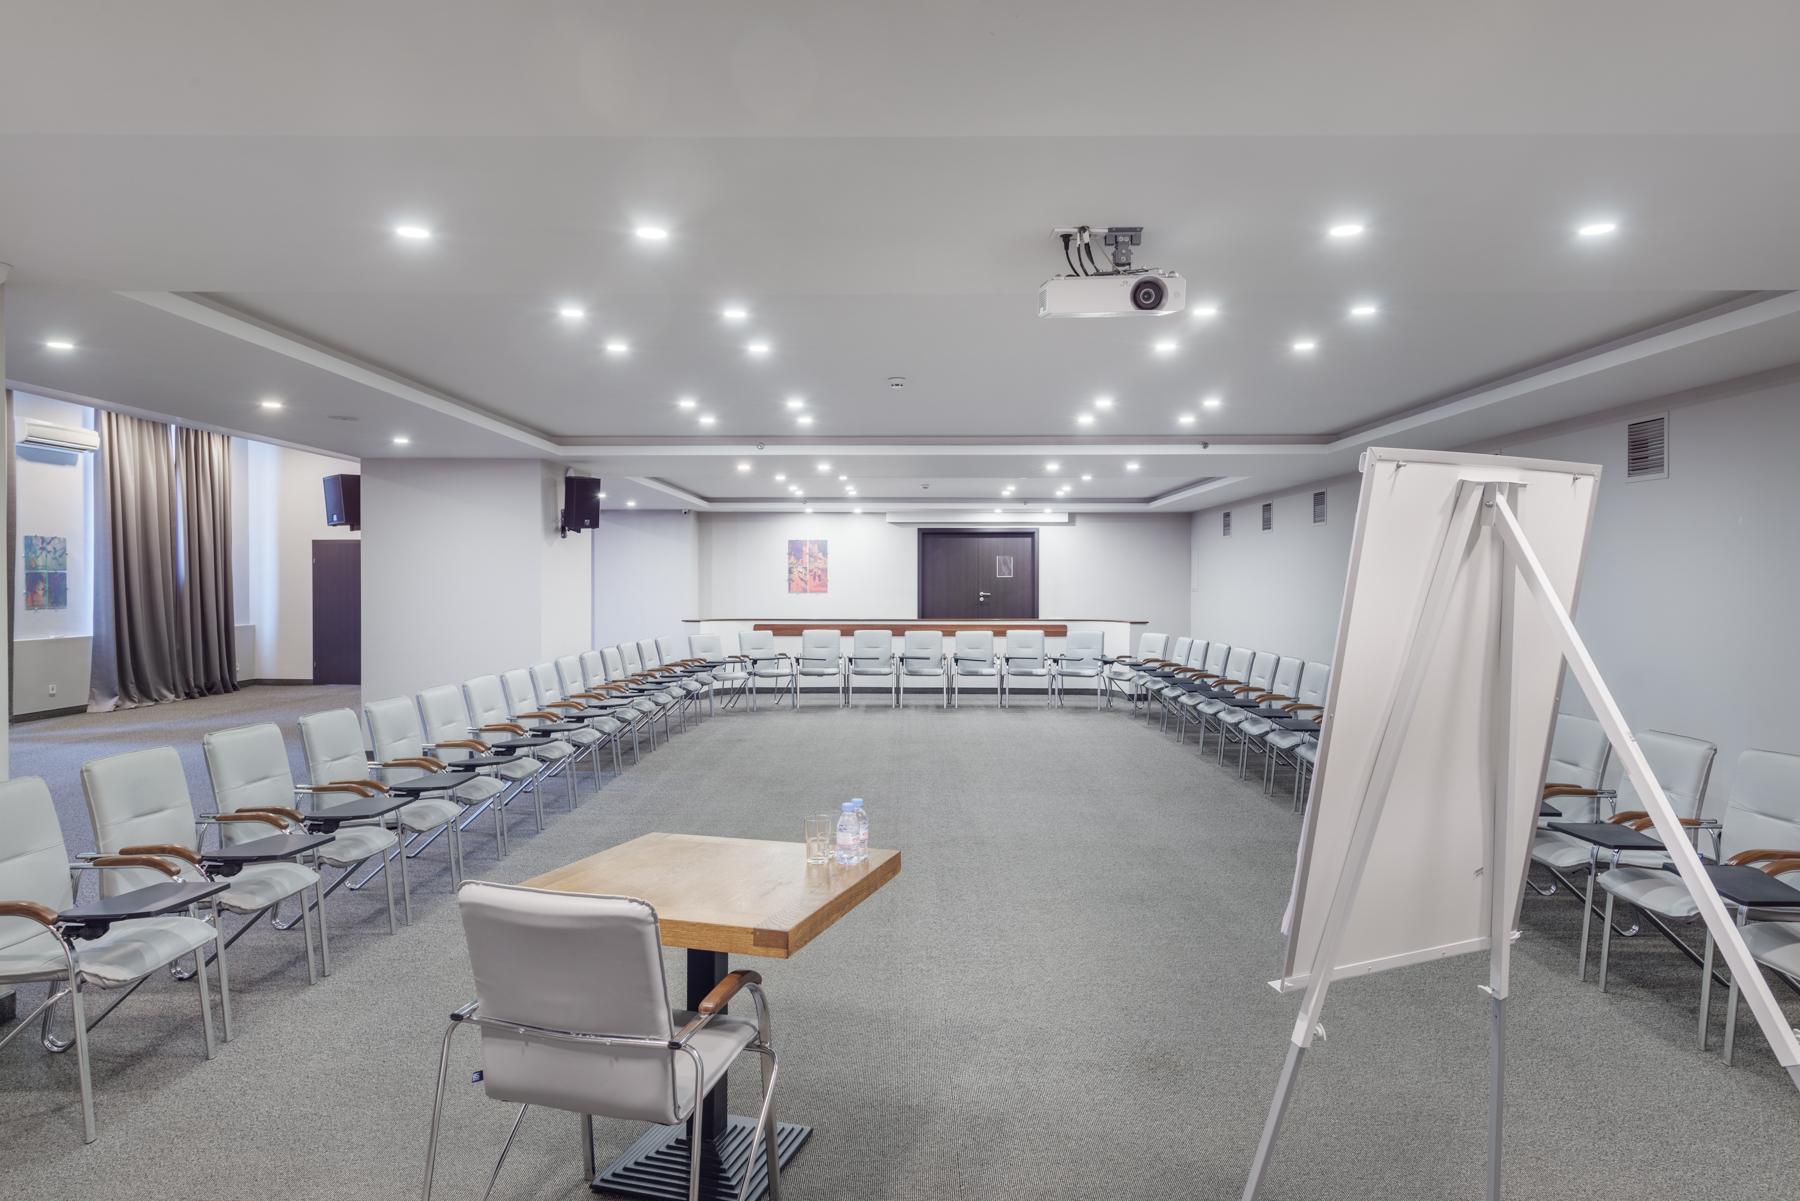 конференц-зал в Одессе